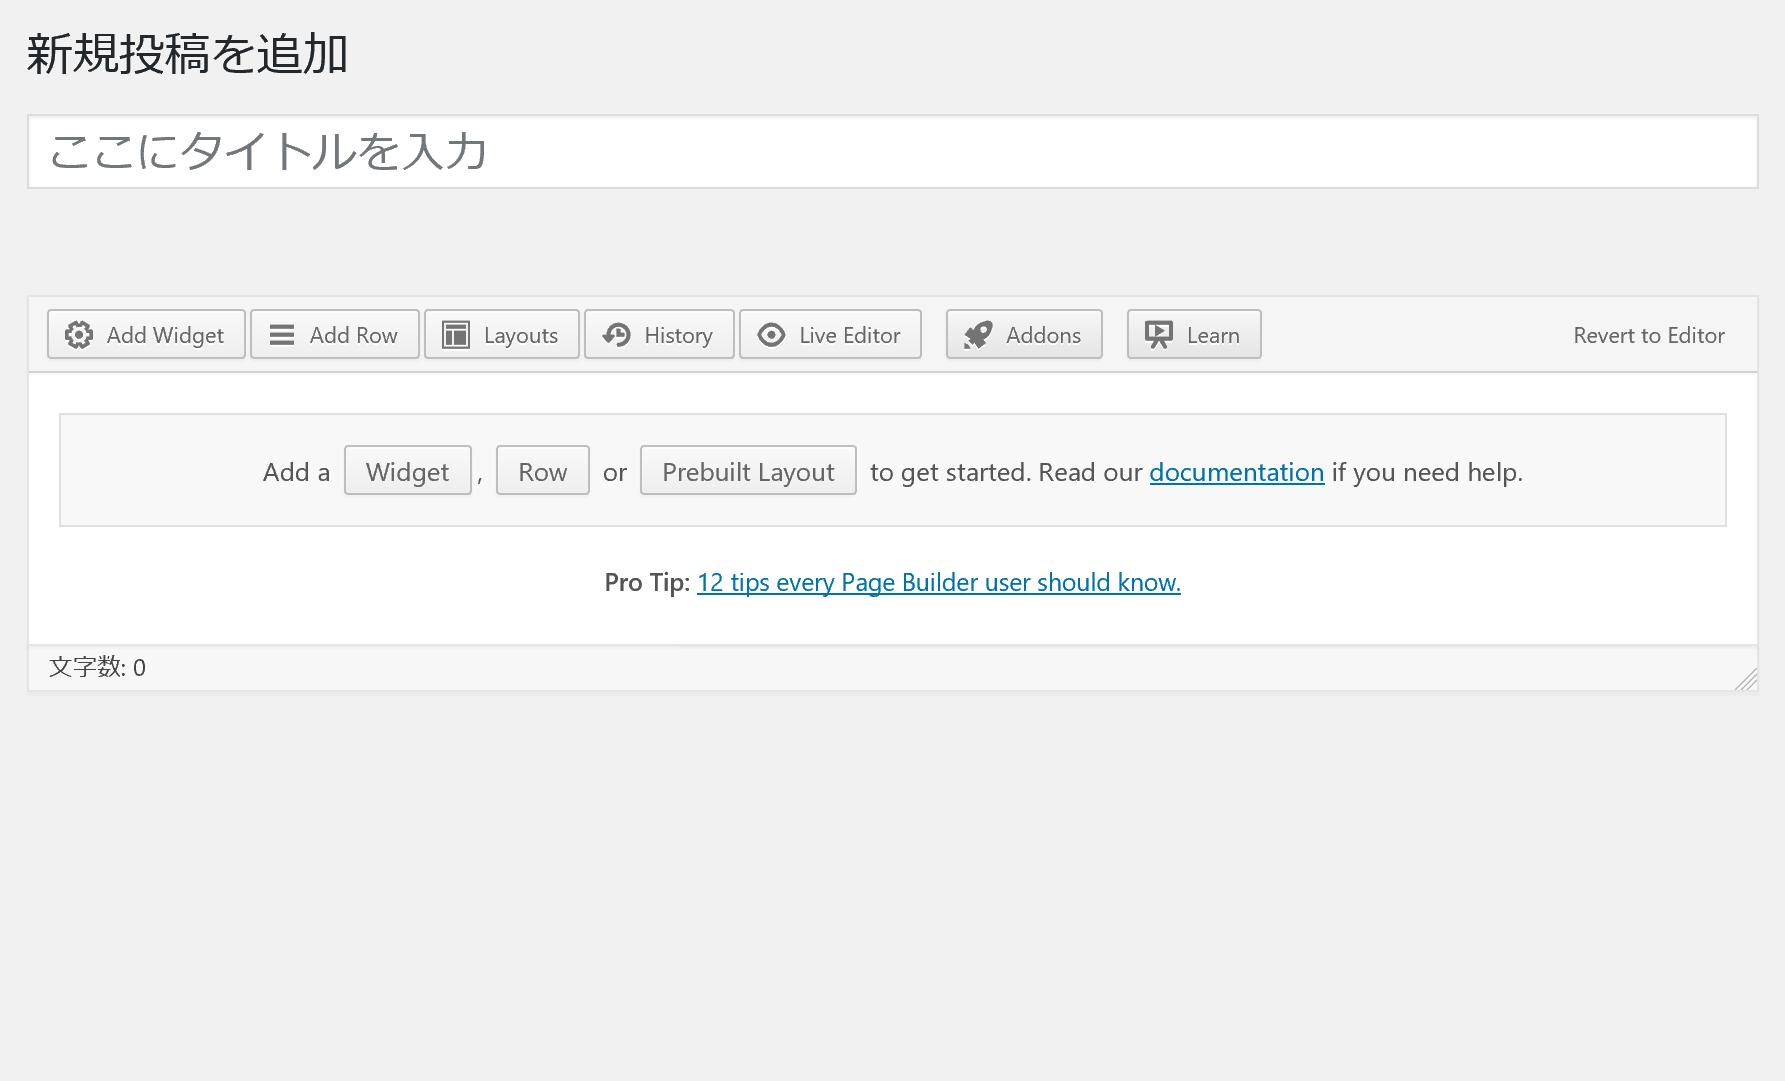 pagebuilder2 - WordPressでカスタマイズしやすいテーマ4選!初心者に具体的なやり方とオススメ本も紹介